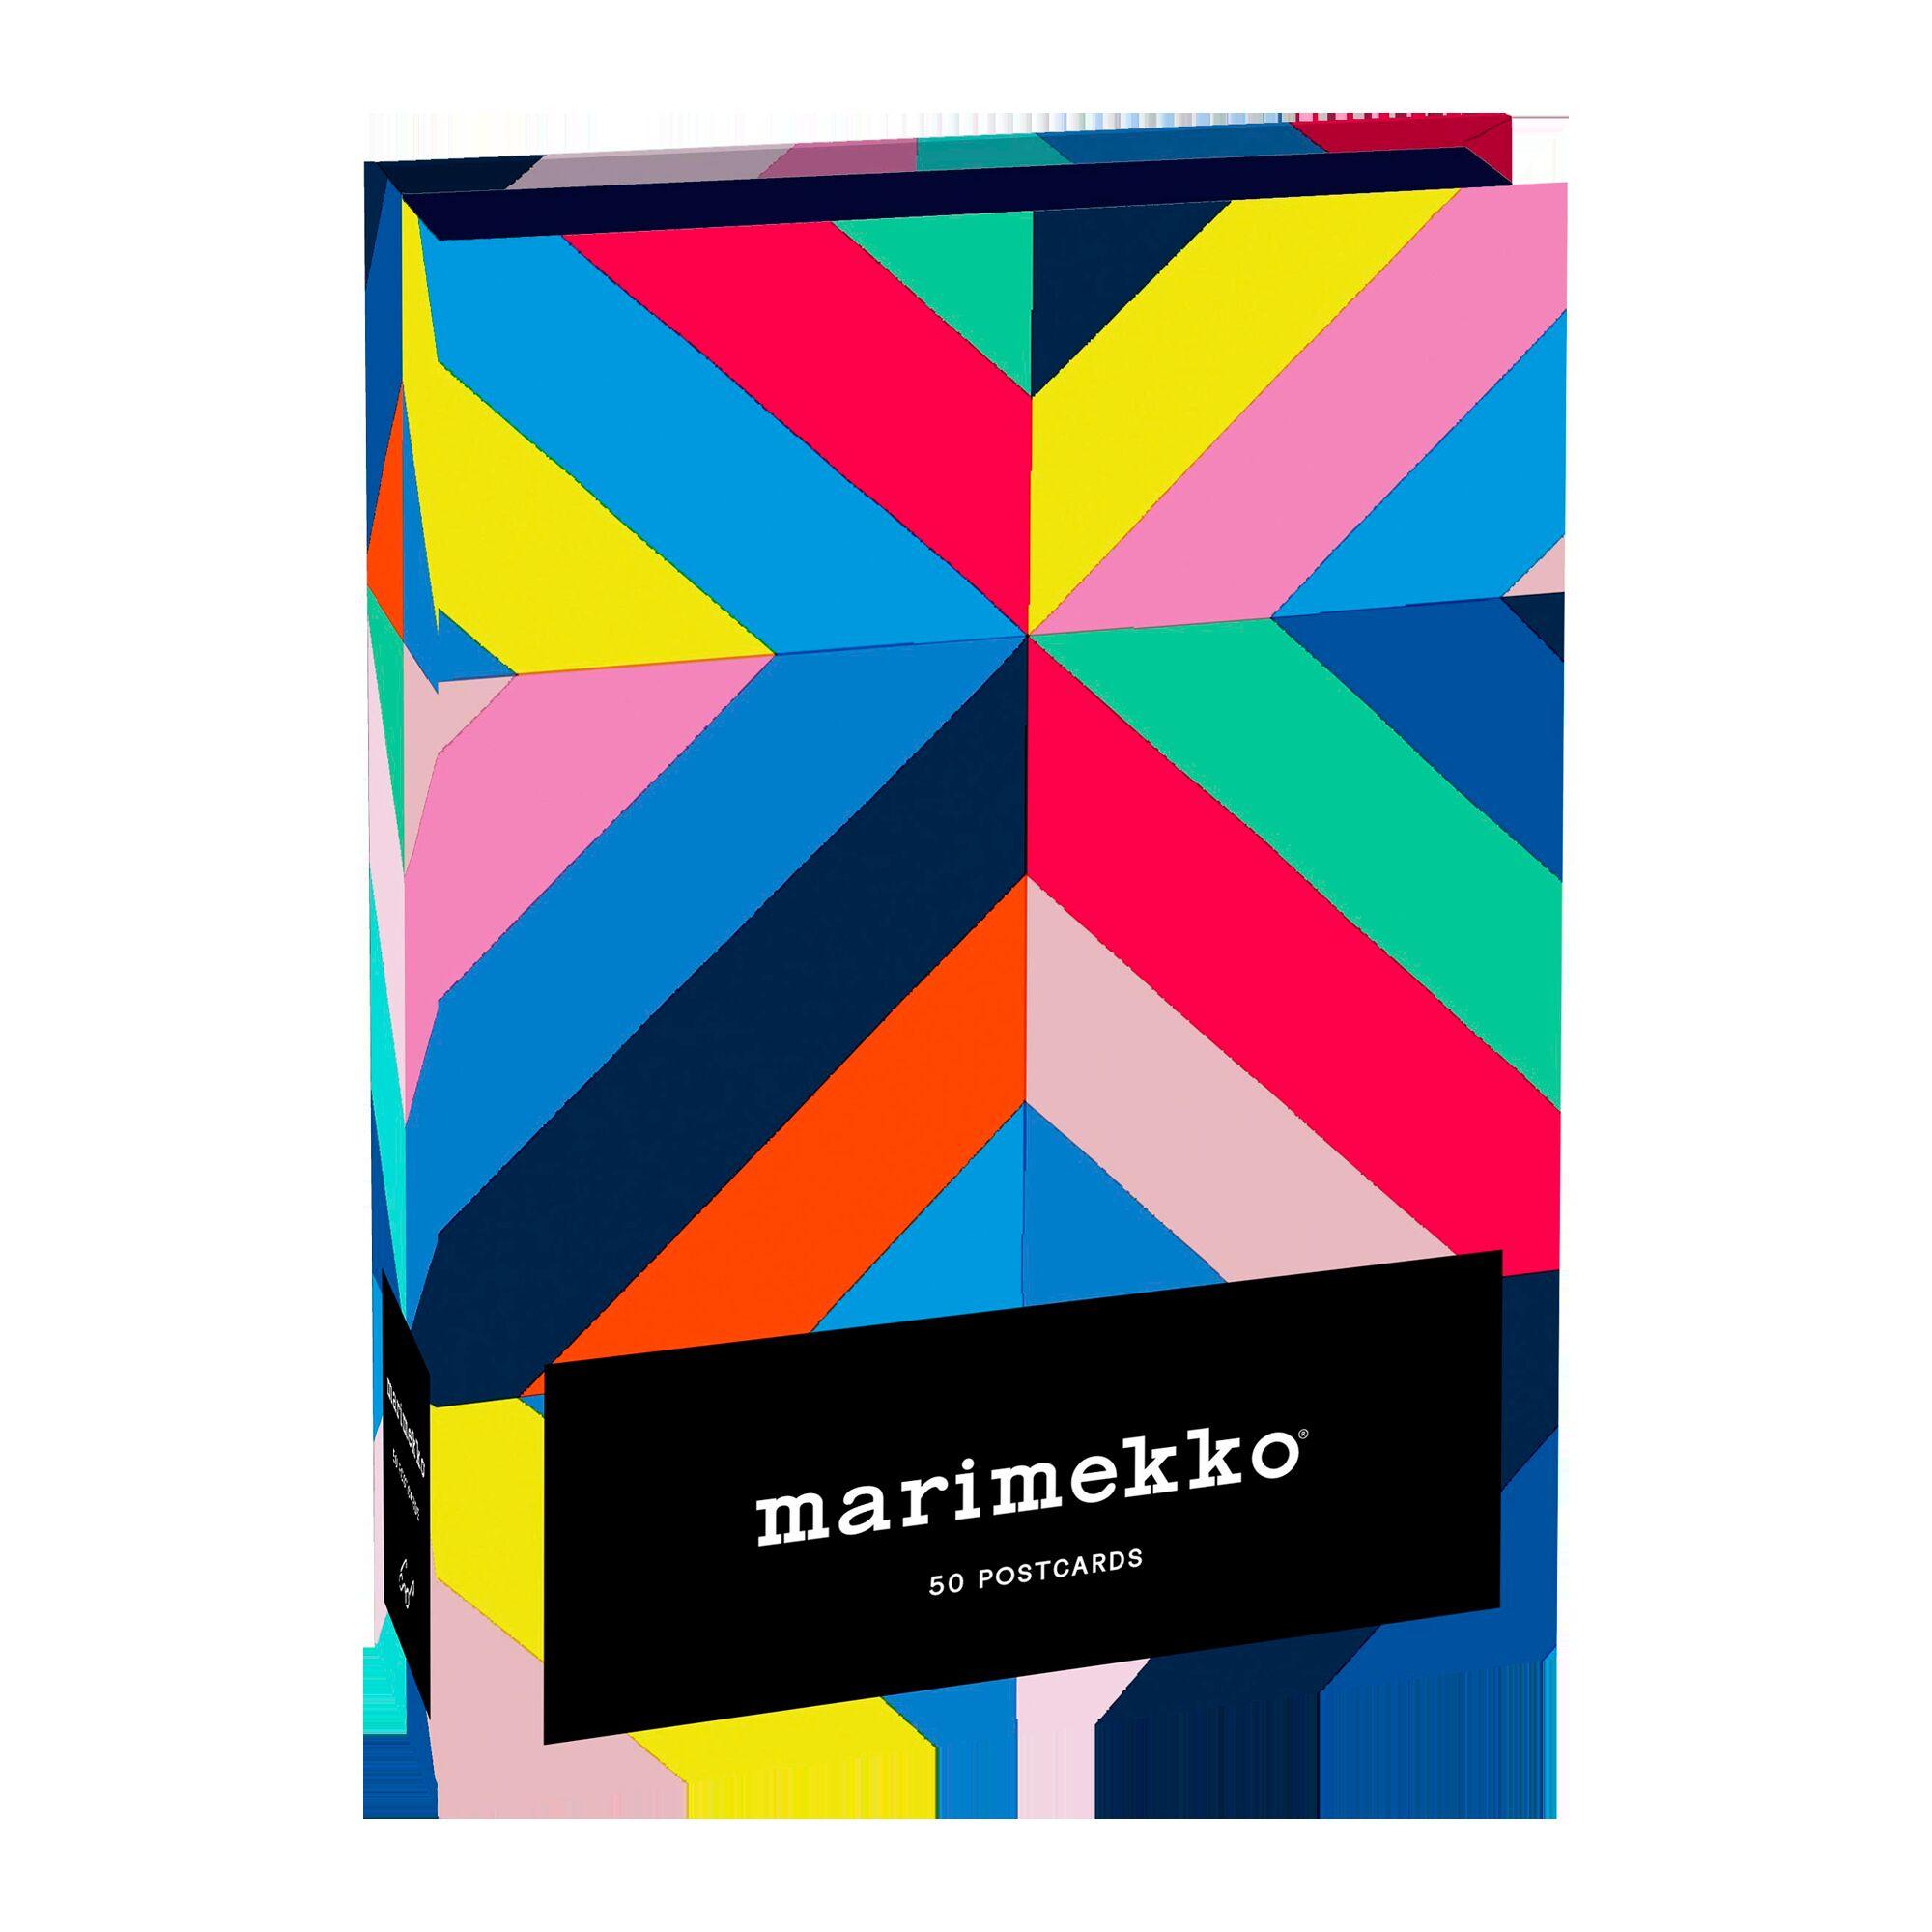 Marimekko: 50 Postcards